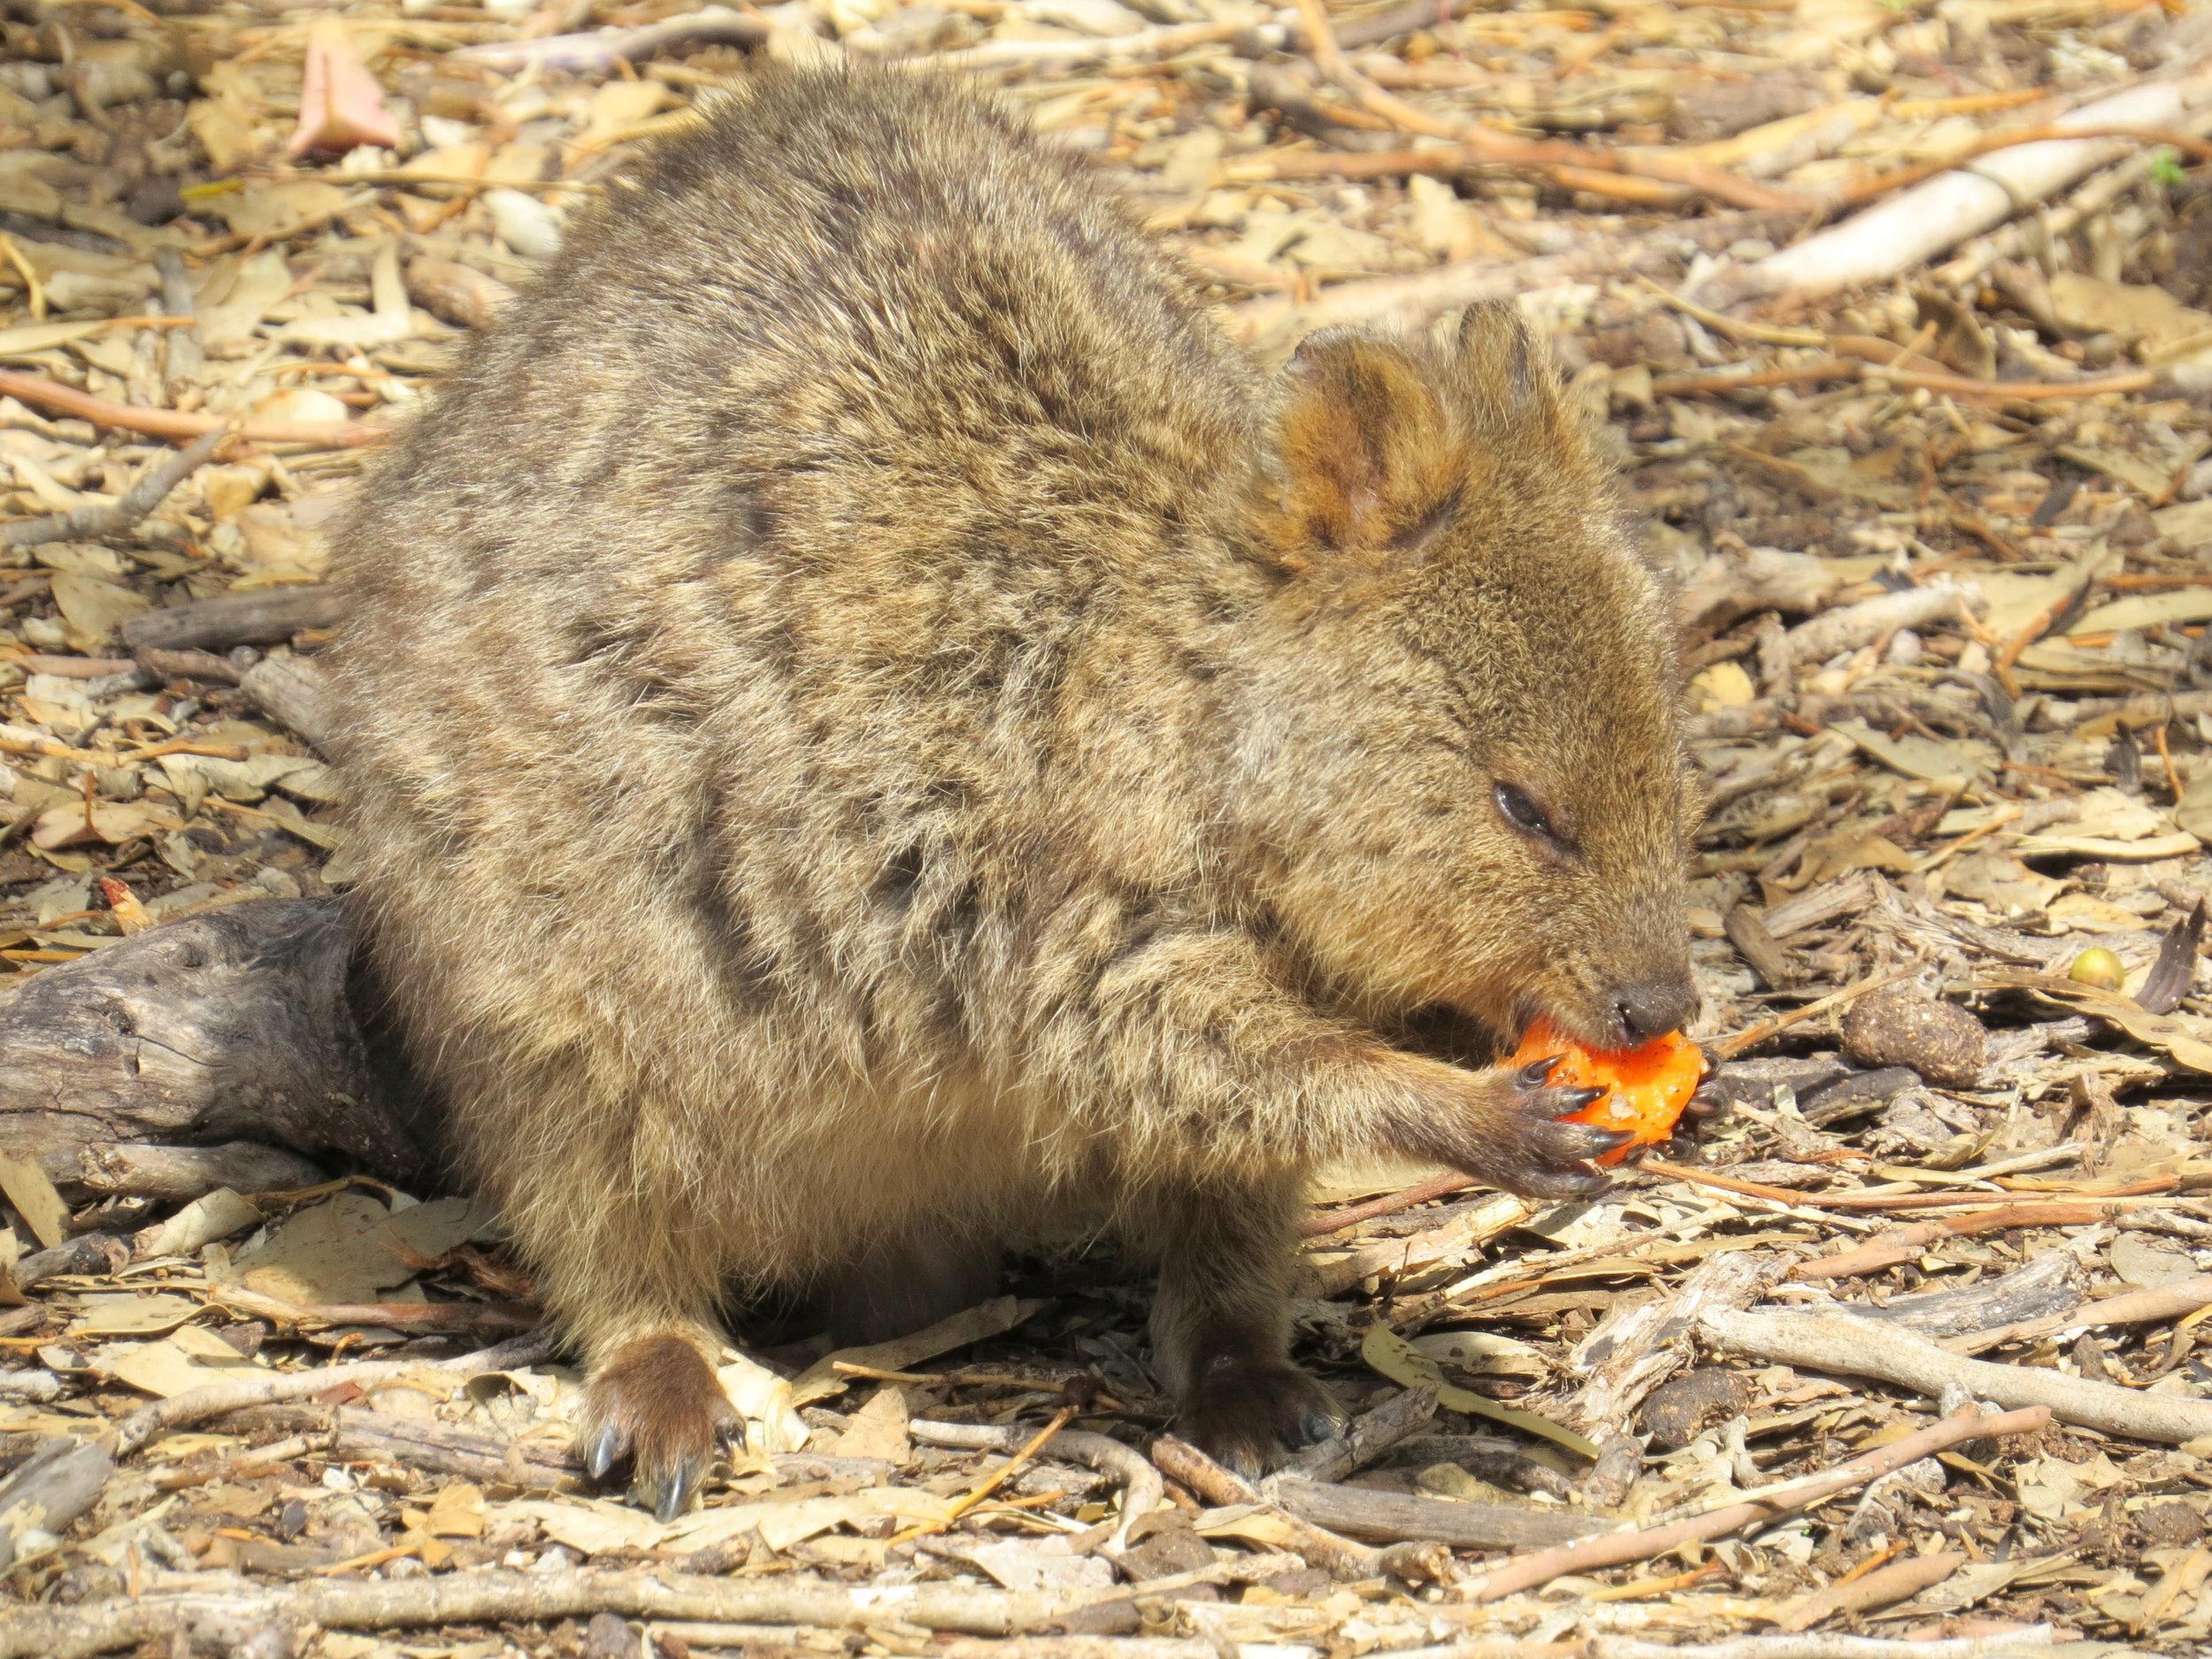 Meet Rottnest Island's most celebrated inhabitant ... the quokka